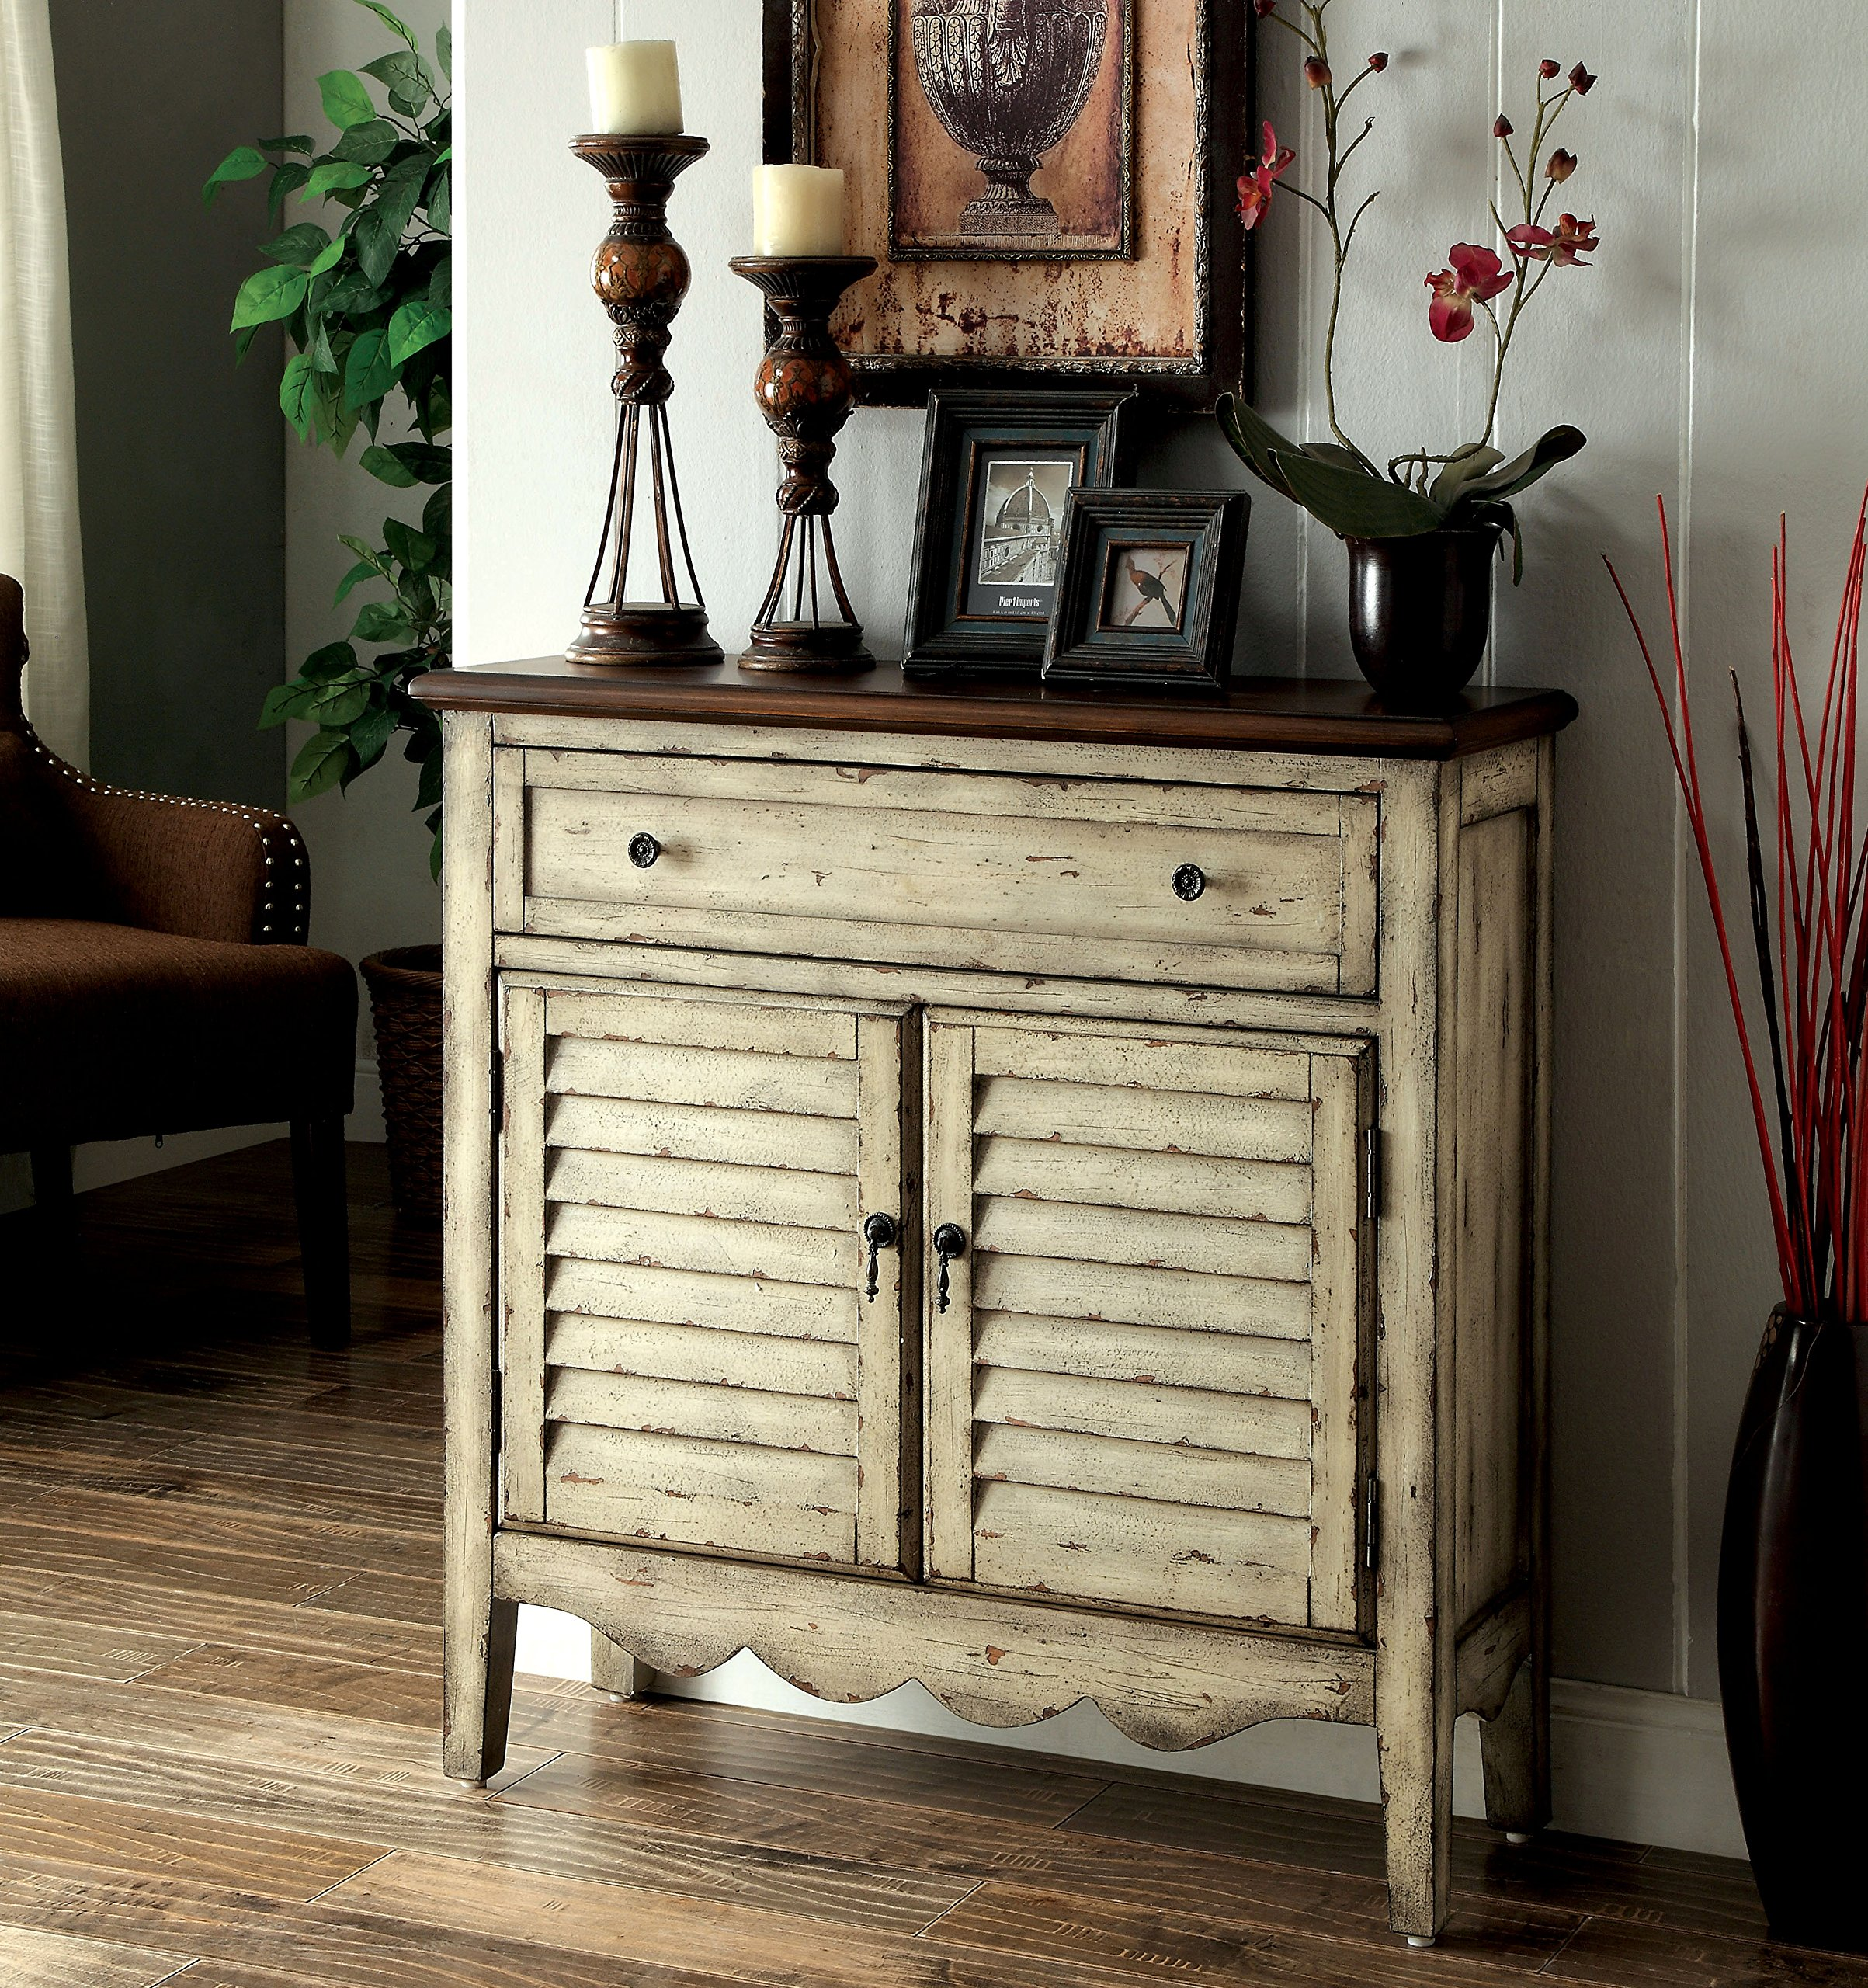 Furniture of America Gladen Vintage Style Storage Cabinet, Antique White/Brown